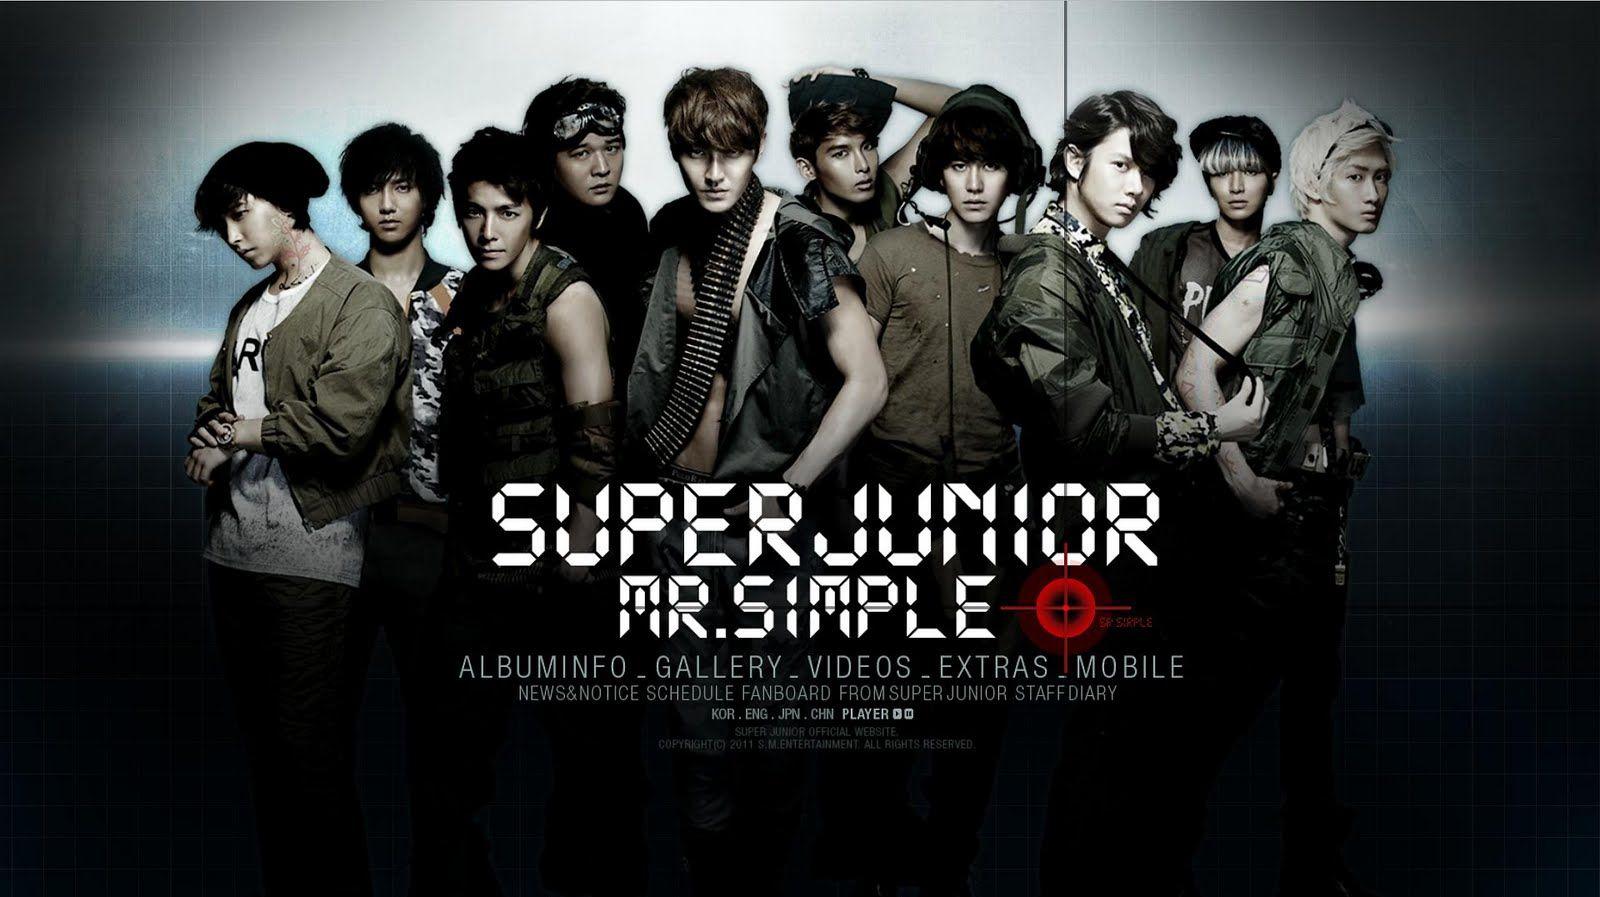 super junior mr simple - Google Search | My Favorite Groups